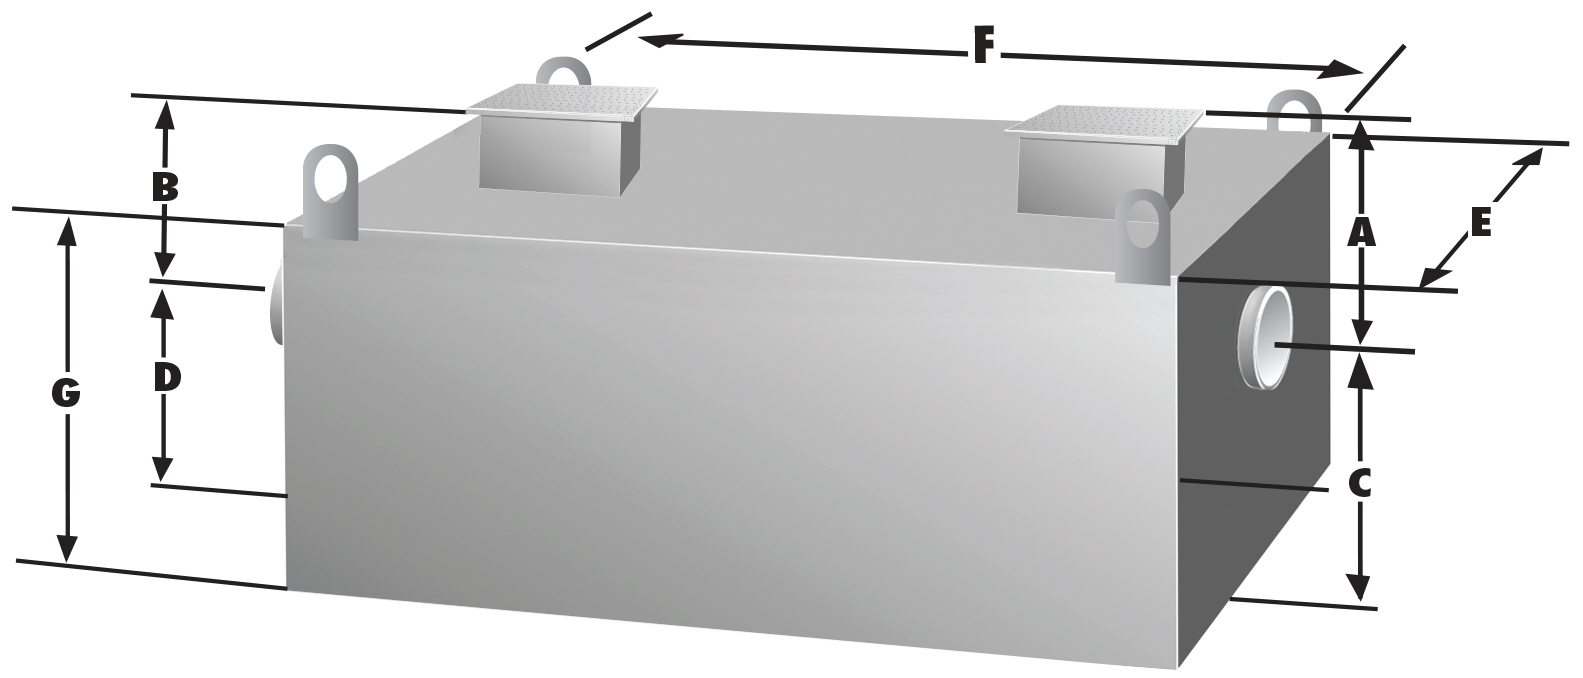 RGI-1250 Image